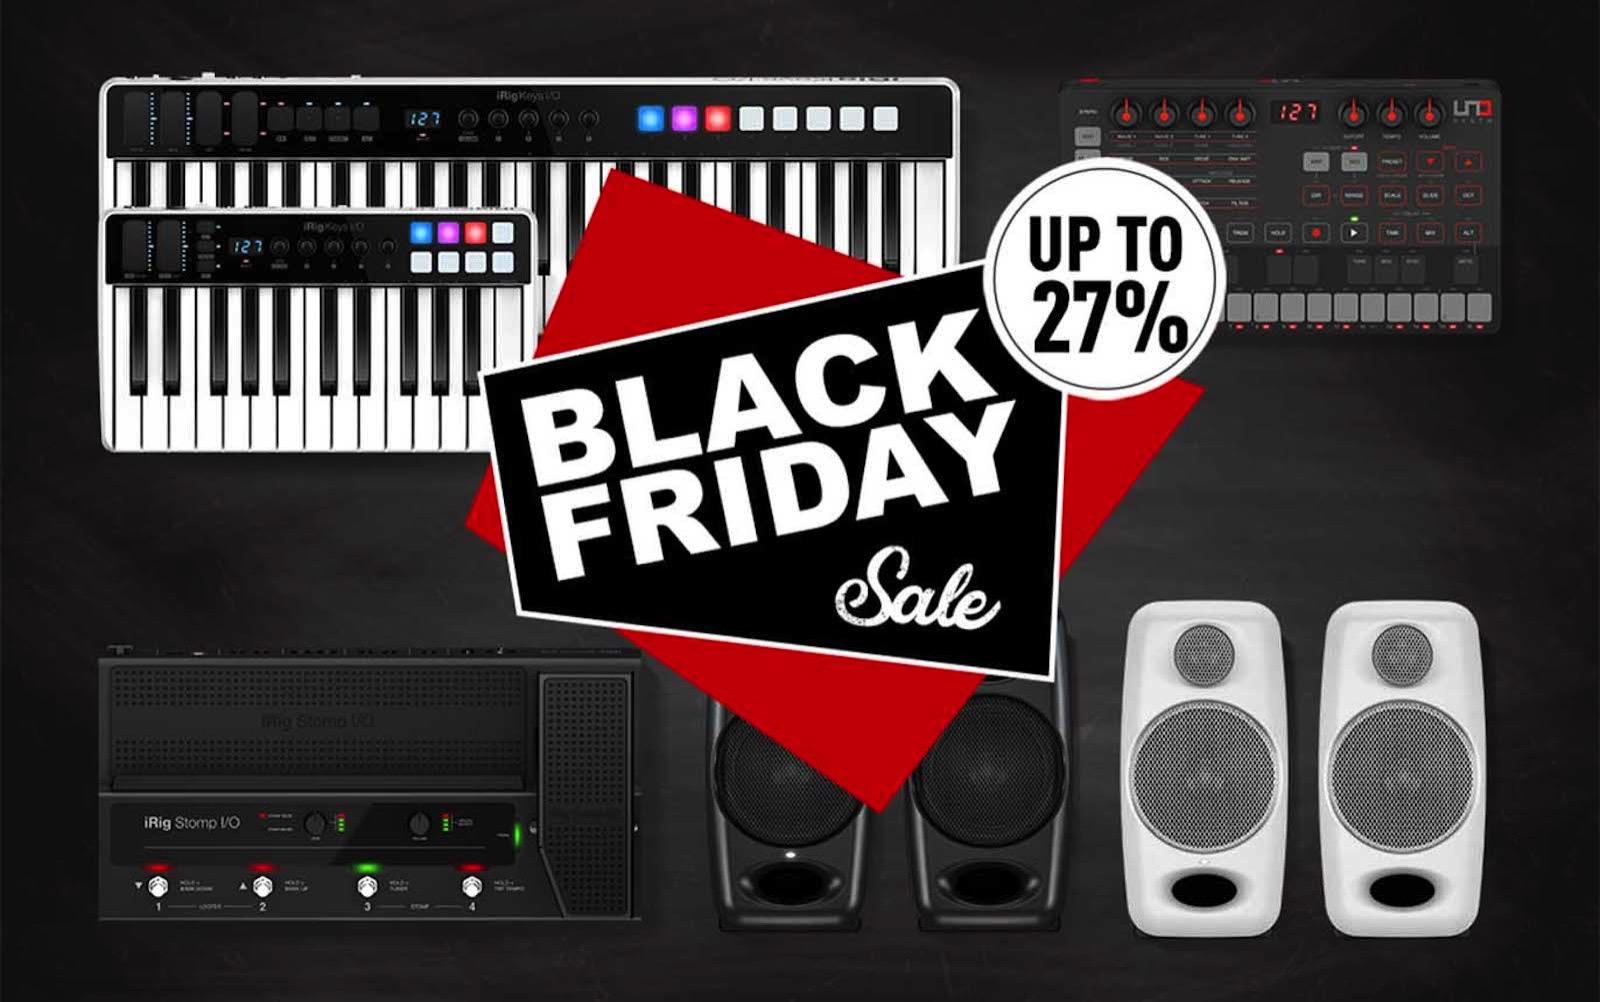 IKMedia Black Friday Sale